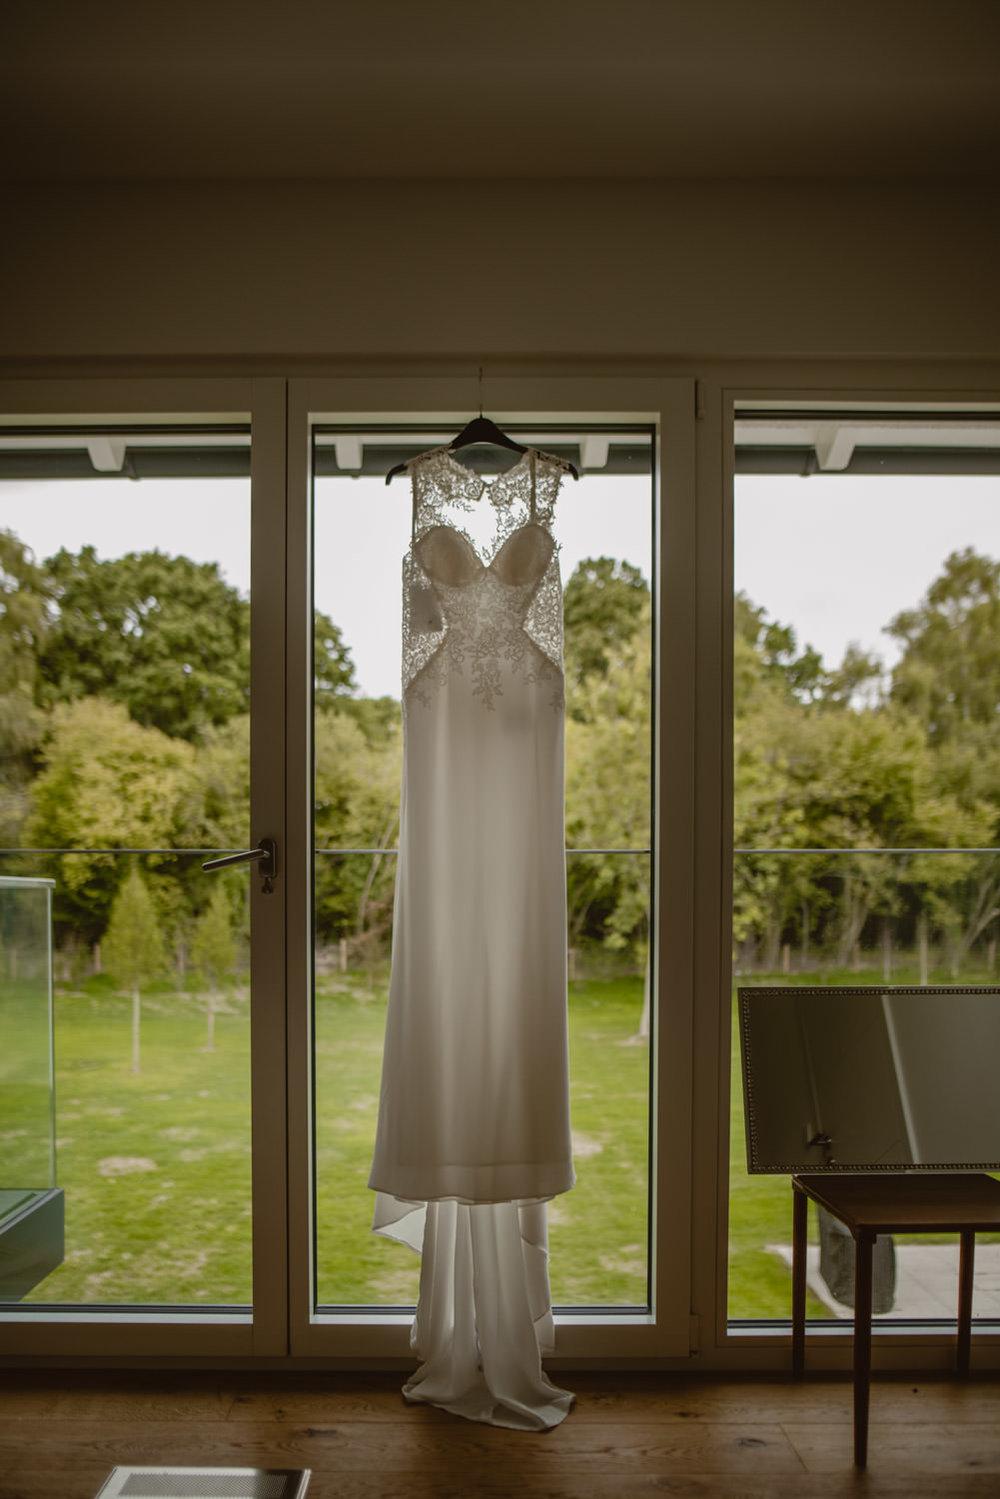 WED2B bridal dress